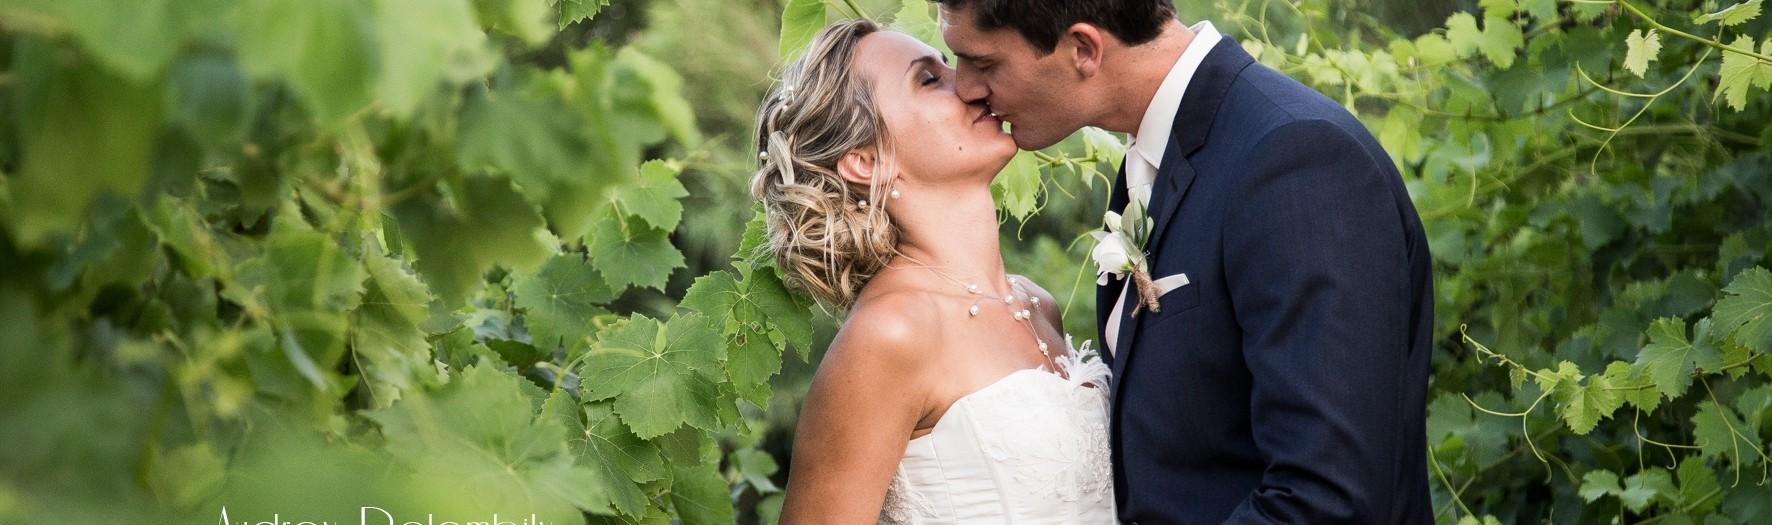 photographe mariage au chteau de laumrade pierrefeu - Chateau De Sully Mariage